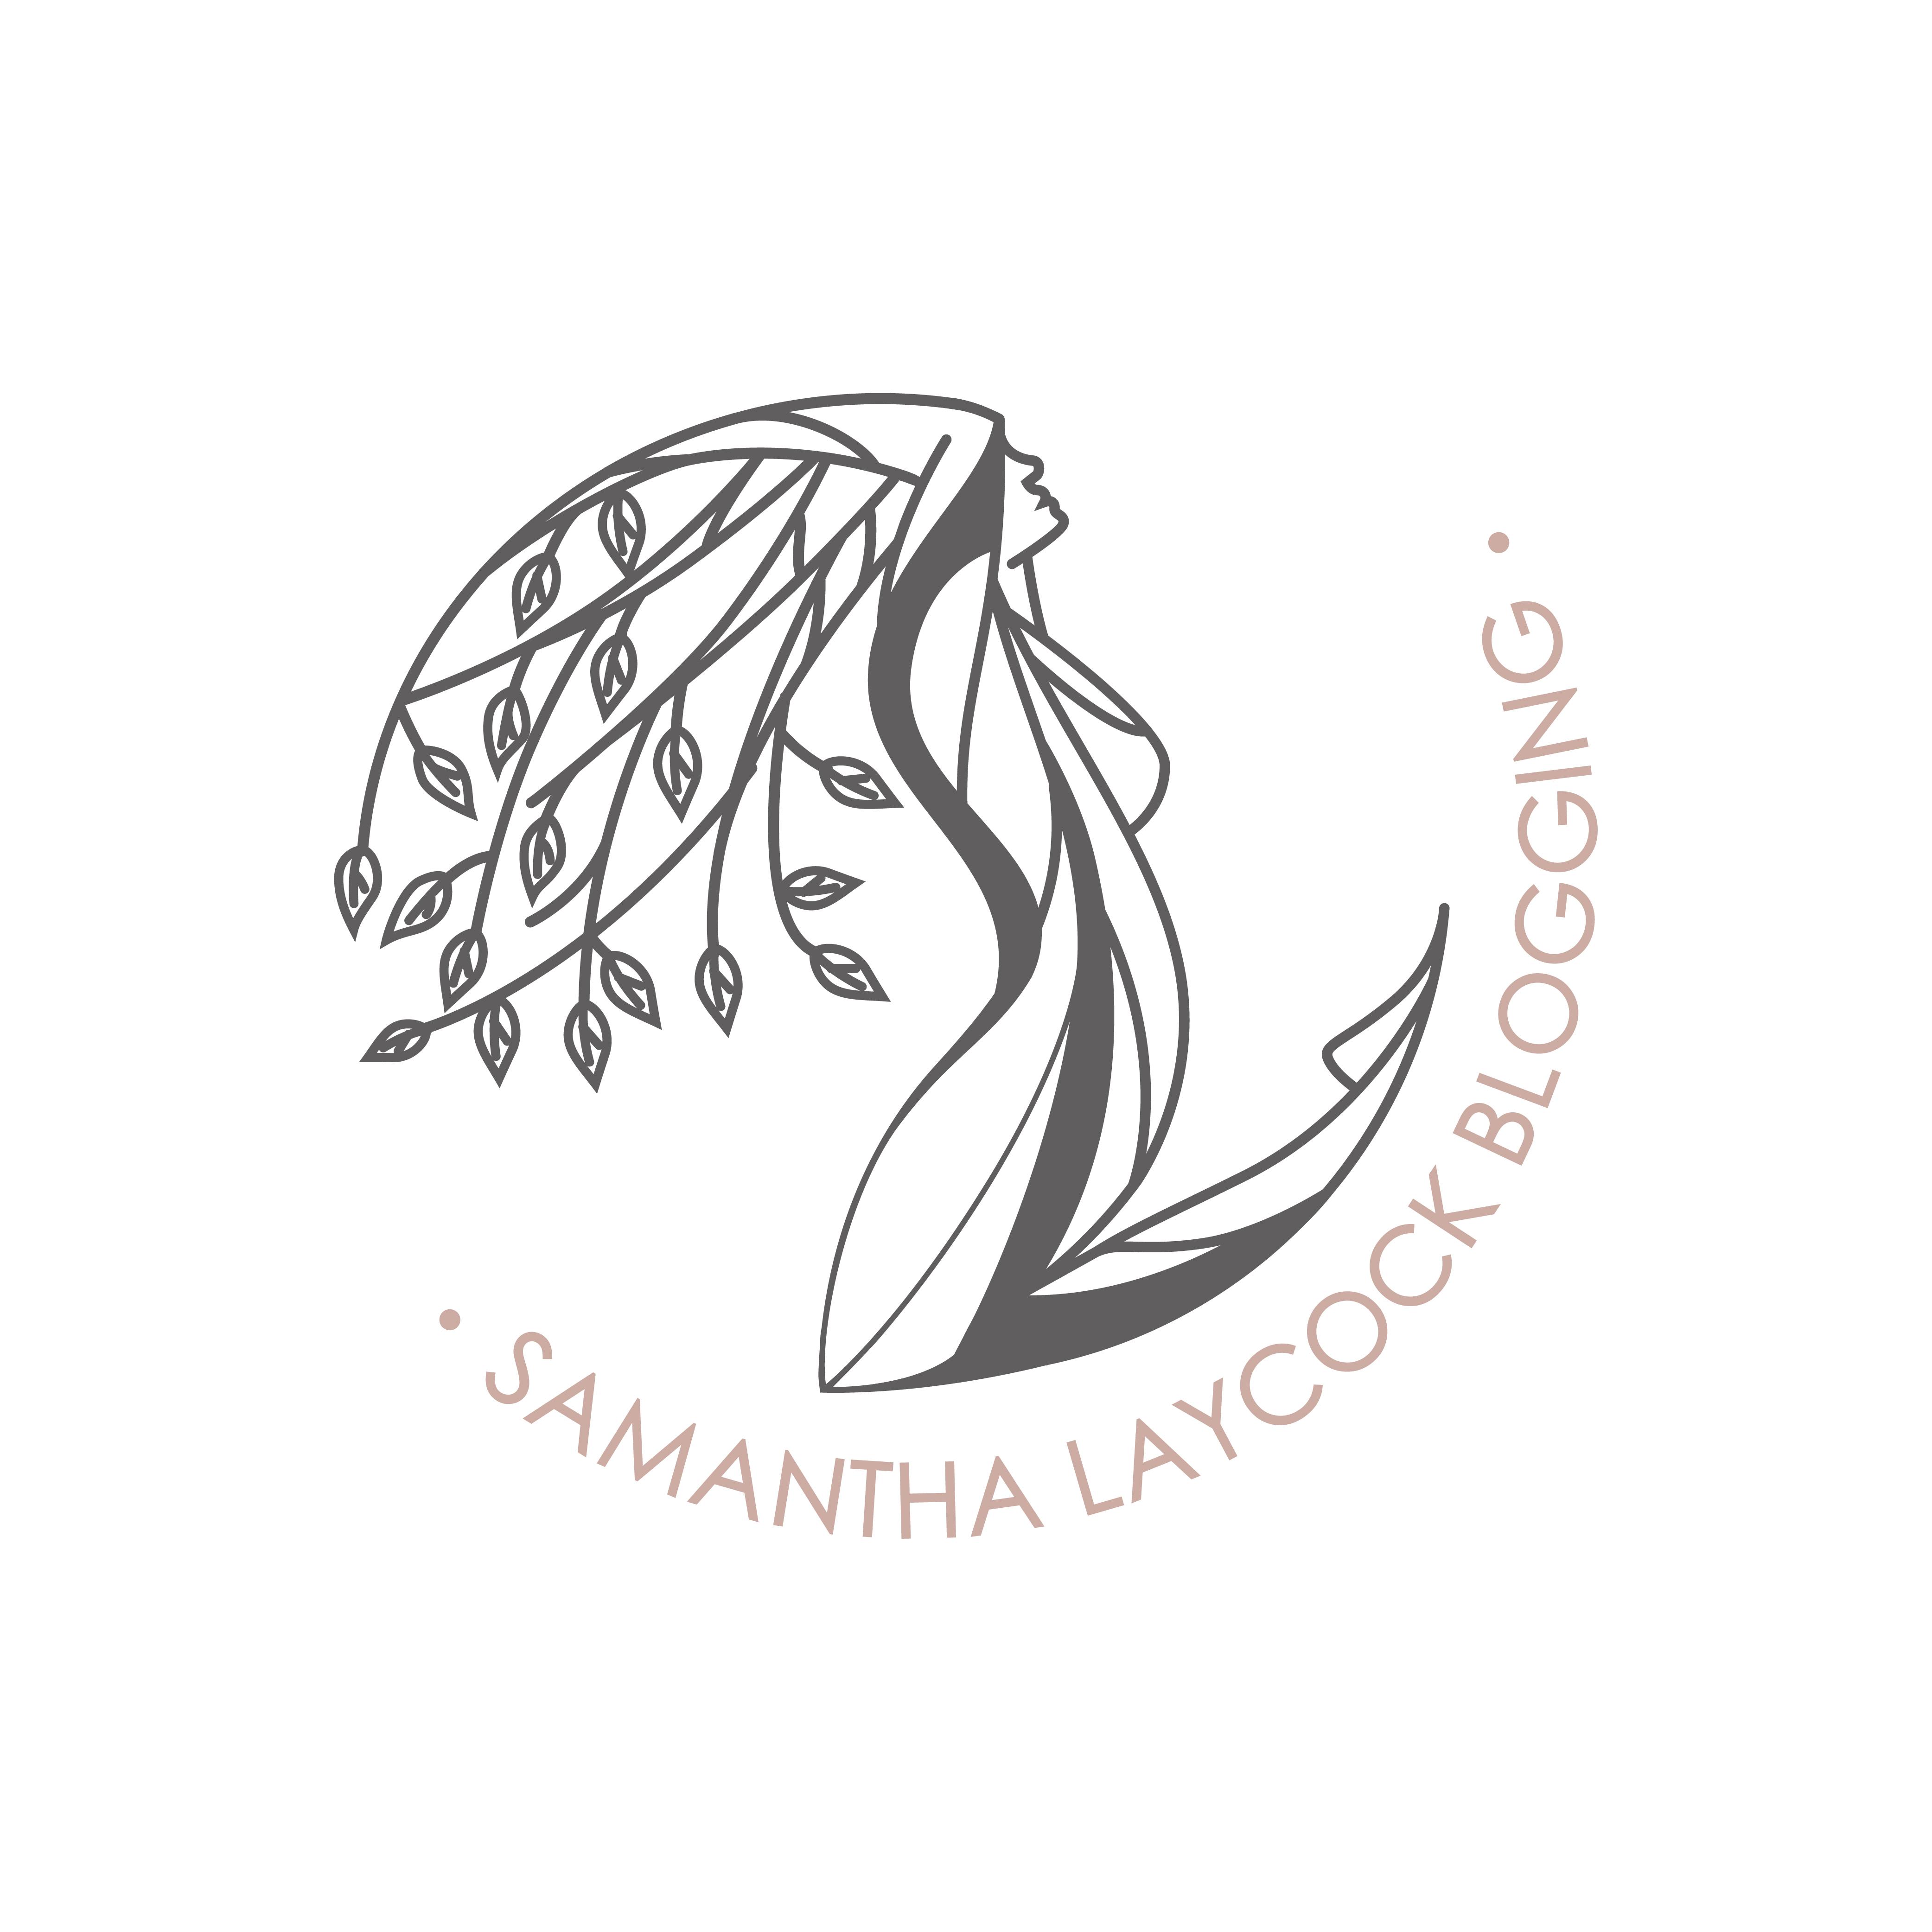 0391_Samantha Laycock blogging-01